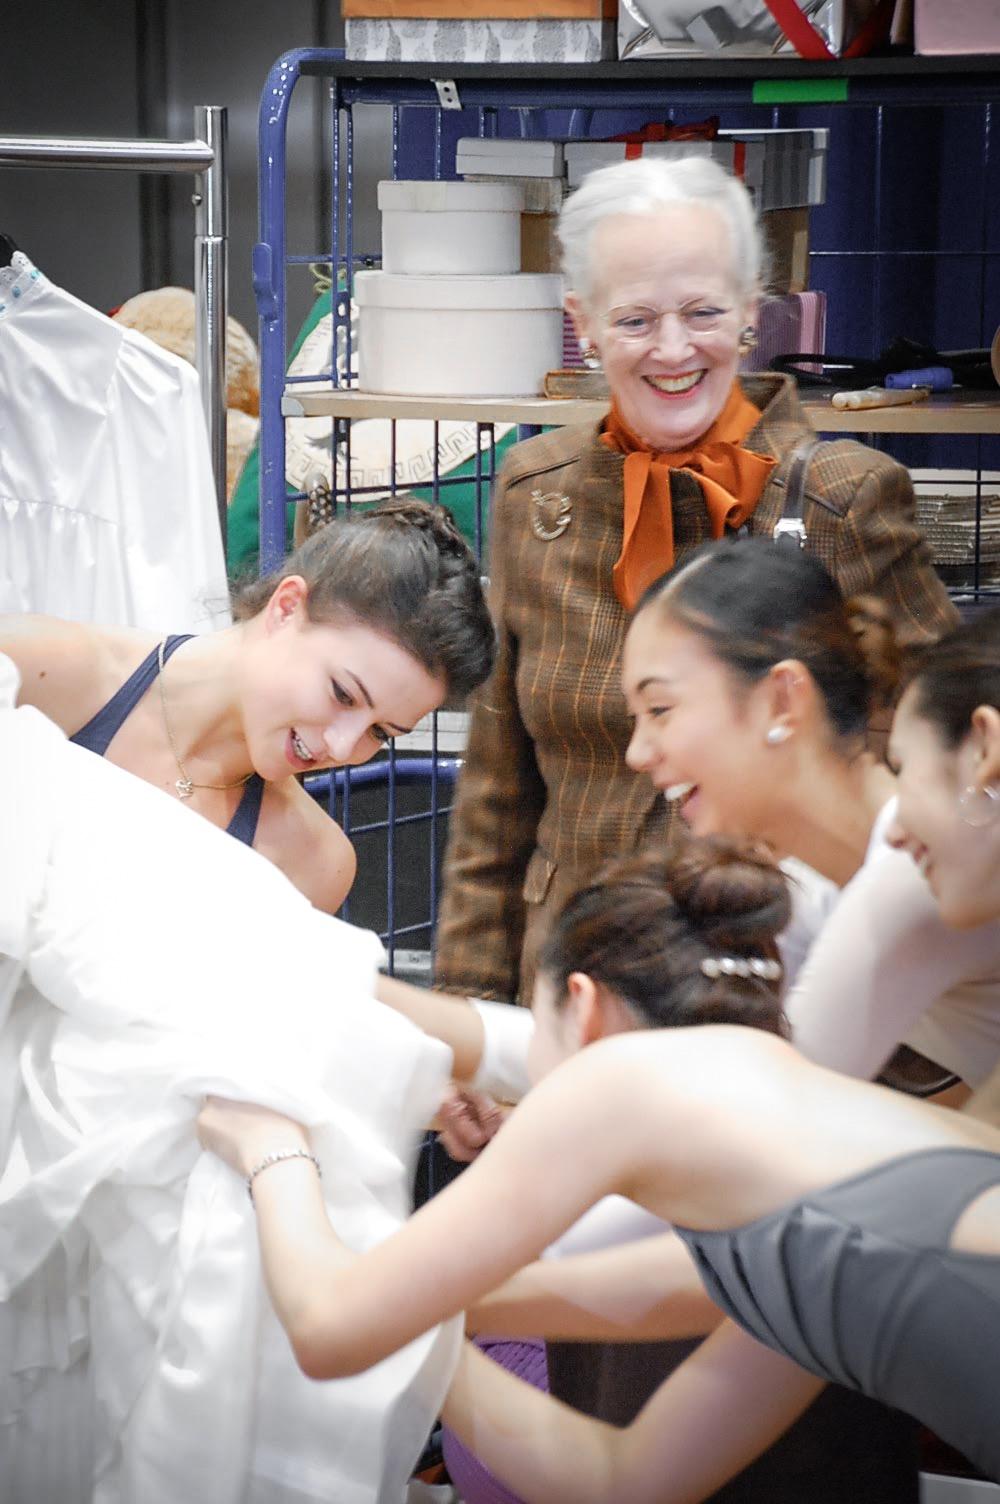 Teaterblik: Pressemøde om Nøddeknækkeren i Tivoli